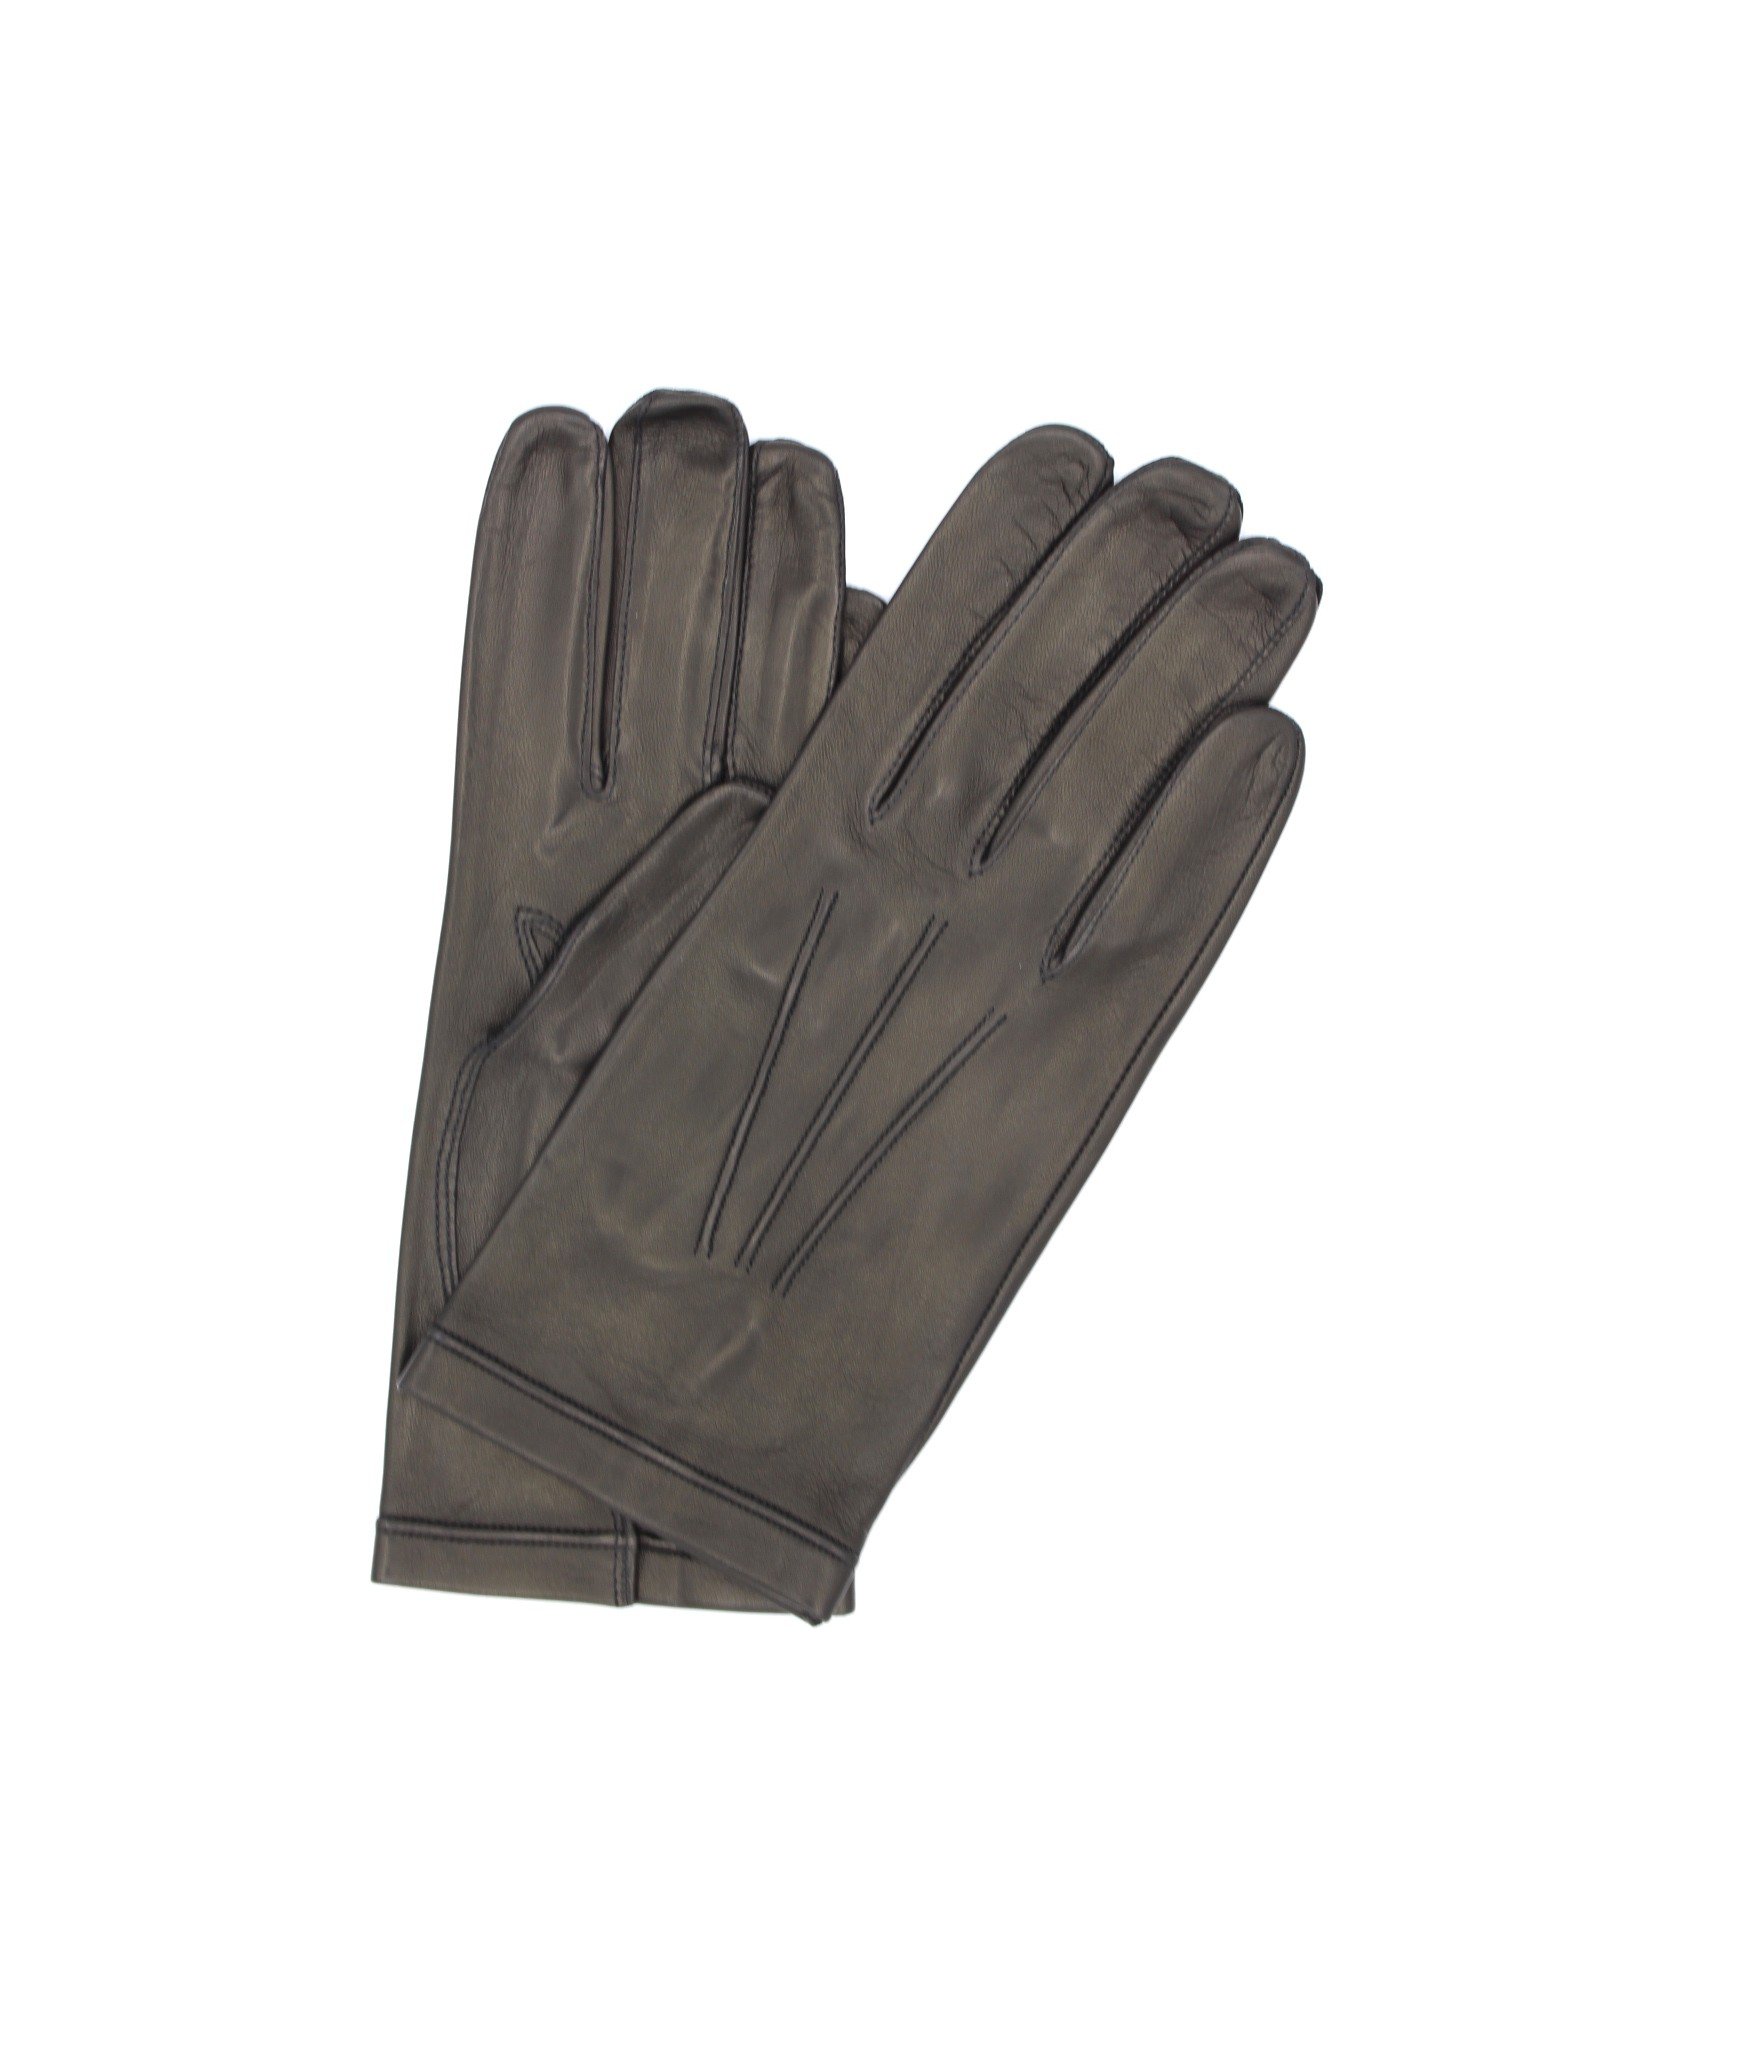 Nappa leather gloves unlined Black Sermoneta Gloves Leather